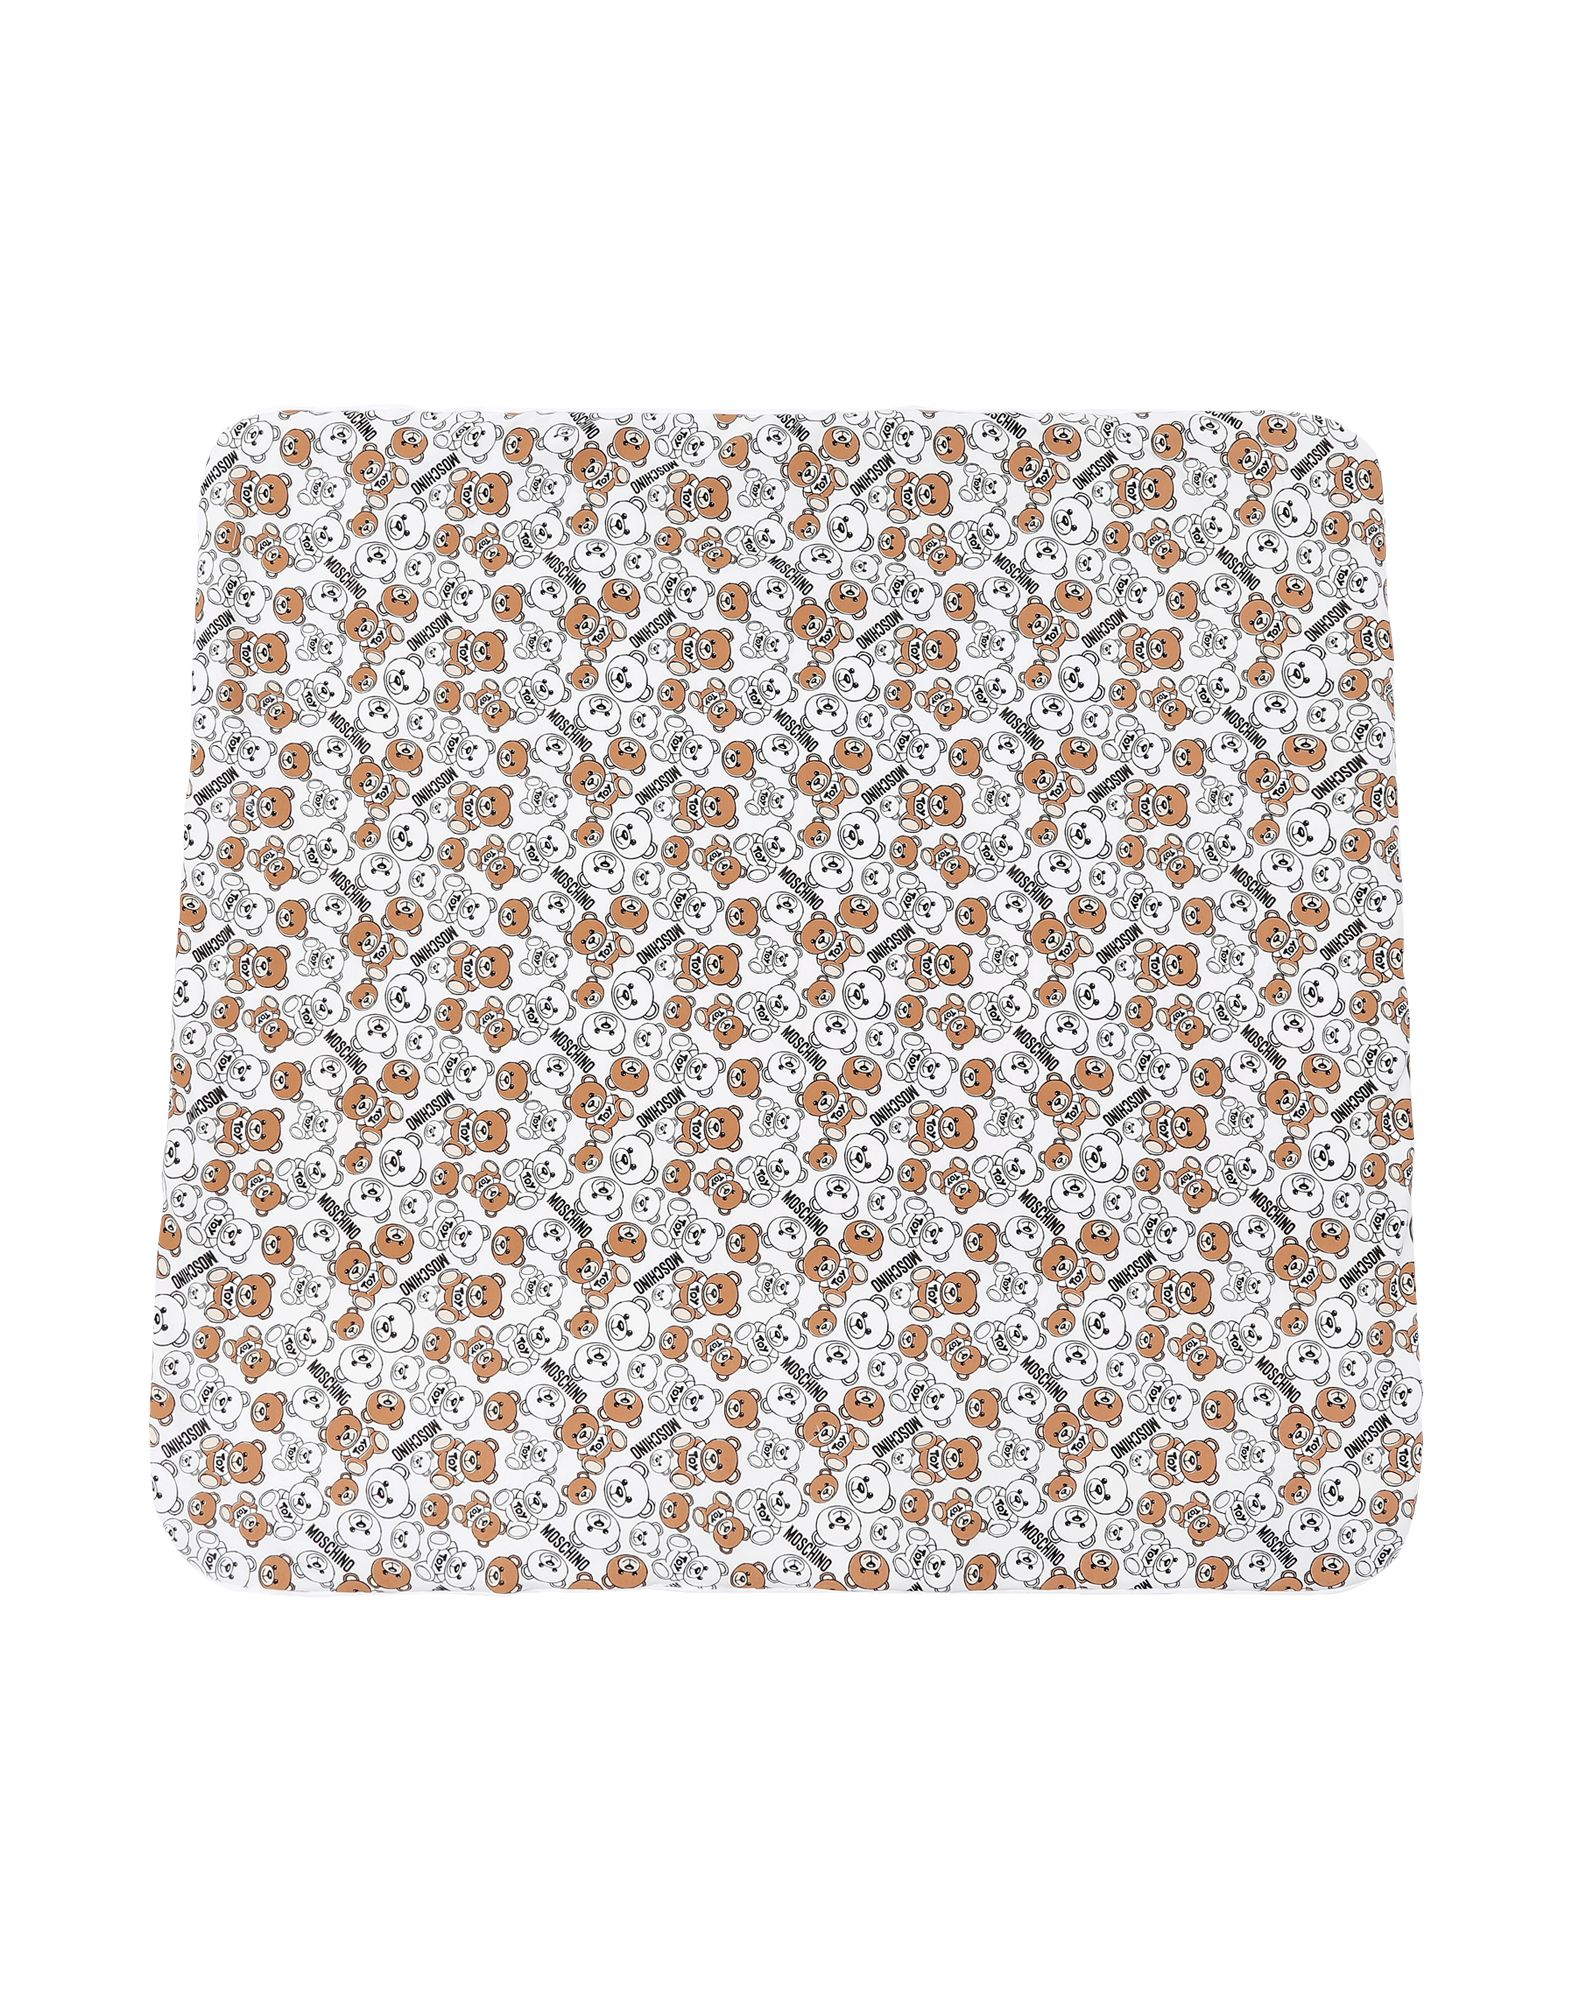 MOSCHINO Одеяльце для младенцев mori одеяльце для младенцев